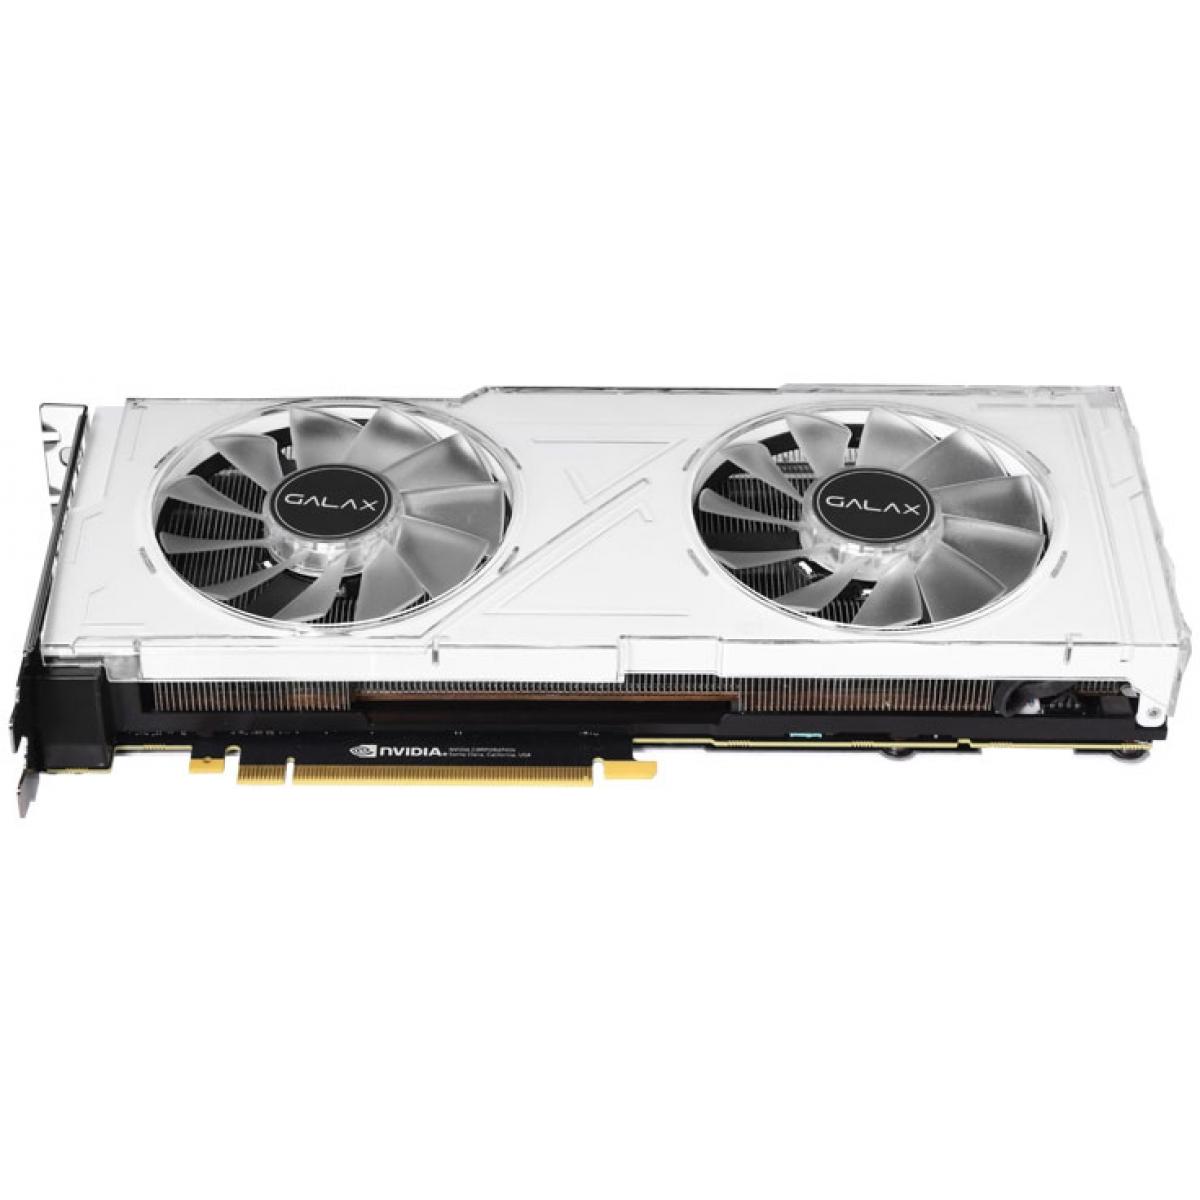 Placa de Vídeo Galax Geforce RTX 2070 OC White Dual, 8GB GDDR6, 256Bit, 27NSL6UCV3TW